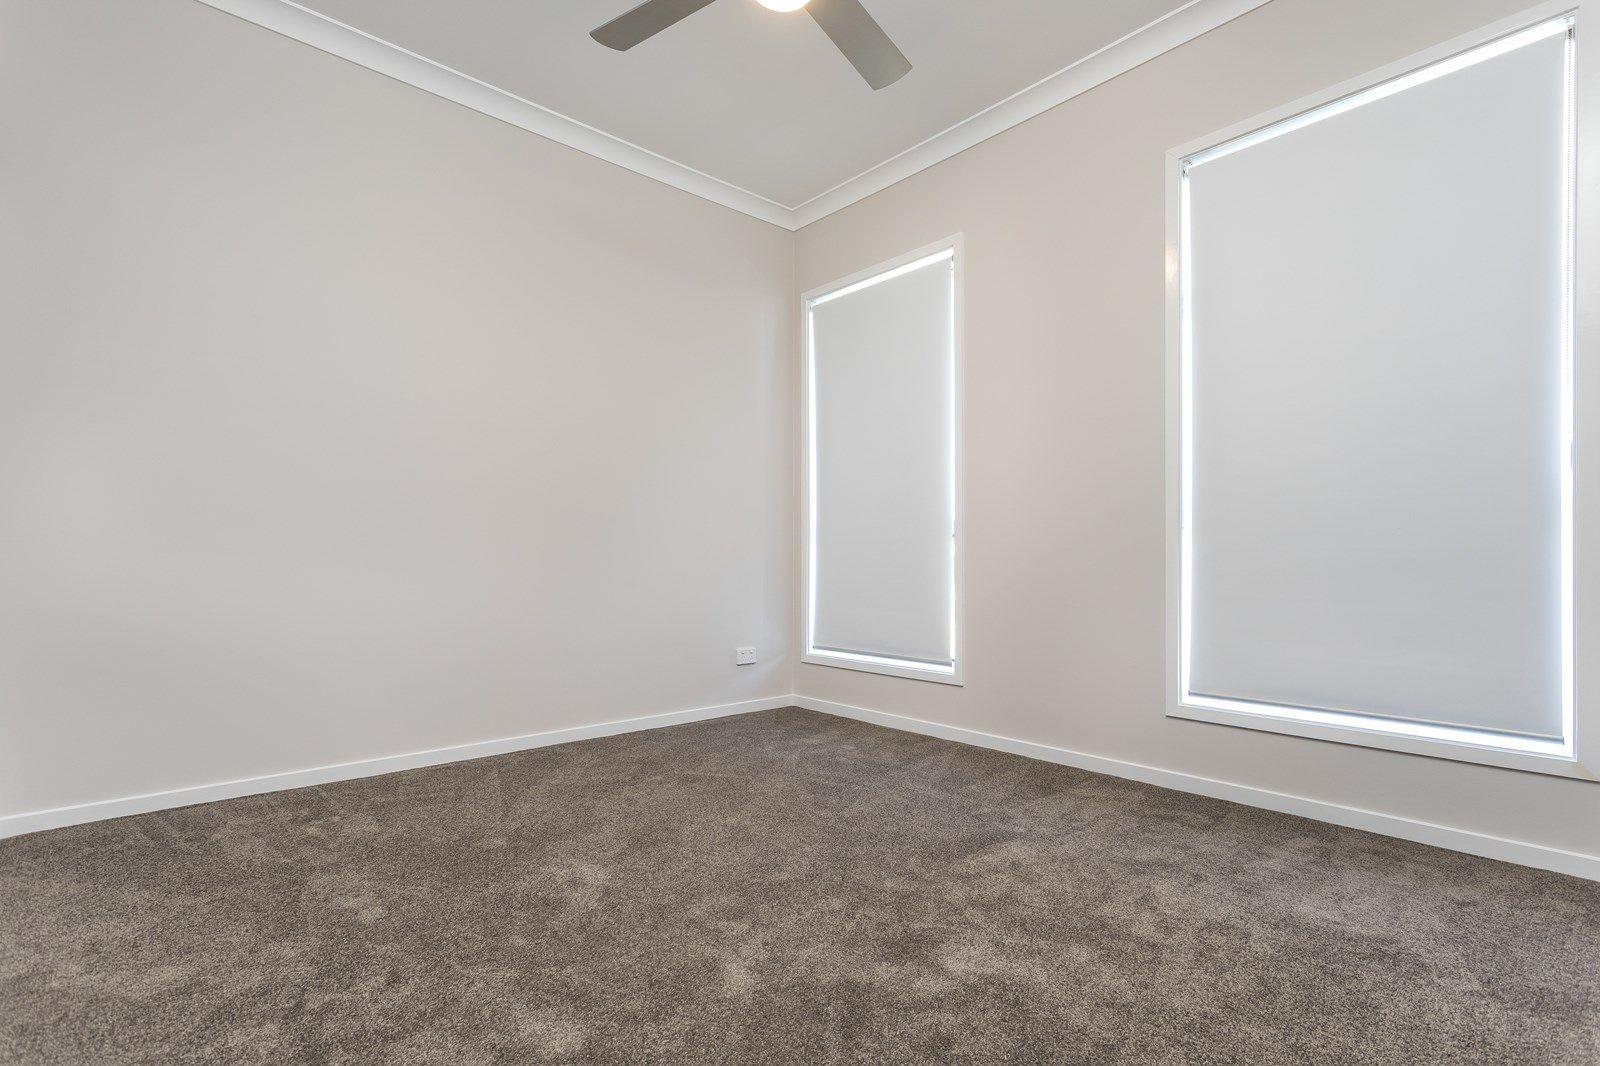 Lot 17 Pondspice Street, Caboolture QLD 4510, Image 1